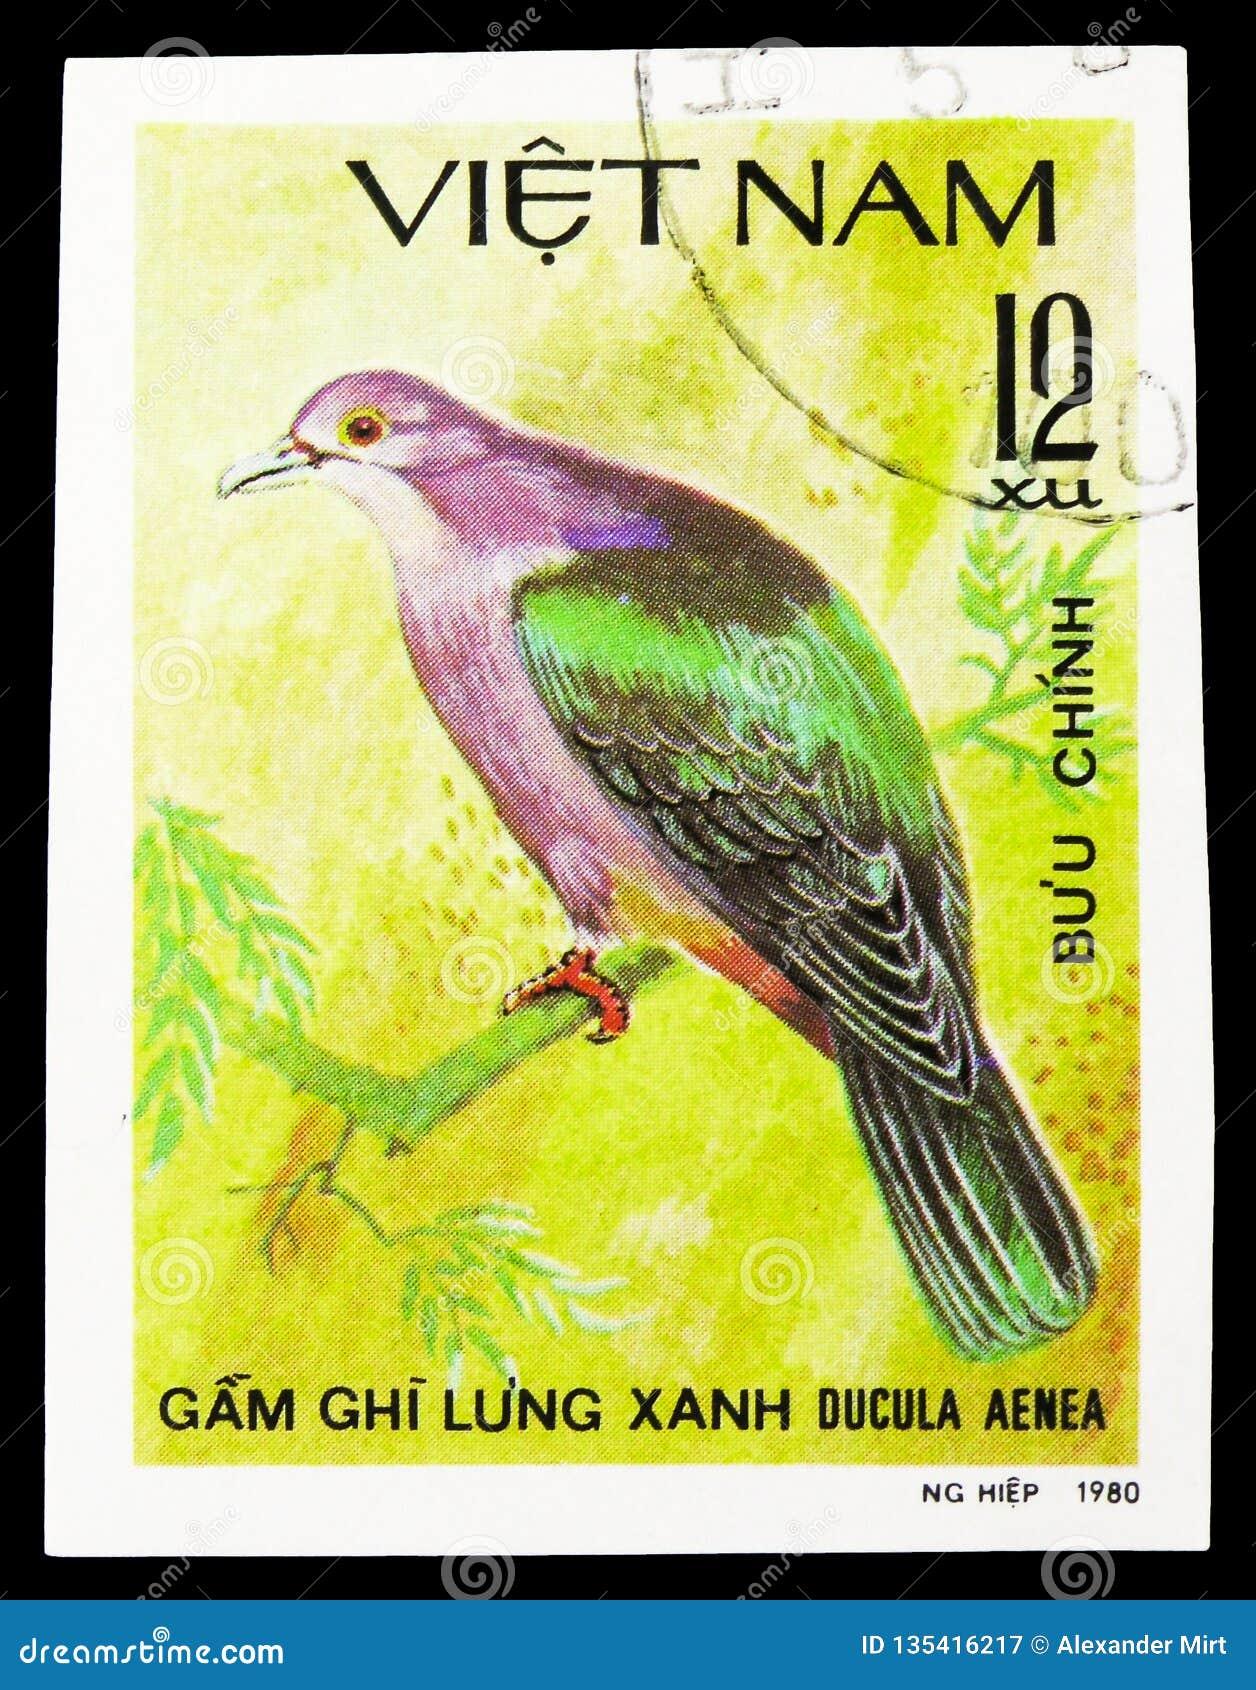 Green Imperial-pigeon (Ducula aenea), Doves serie, circa 1981